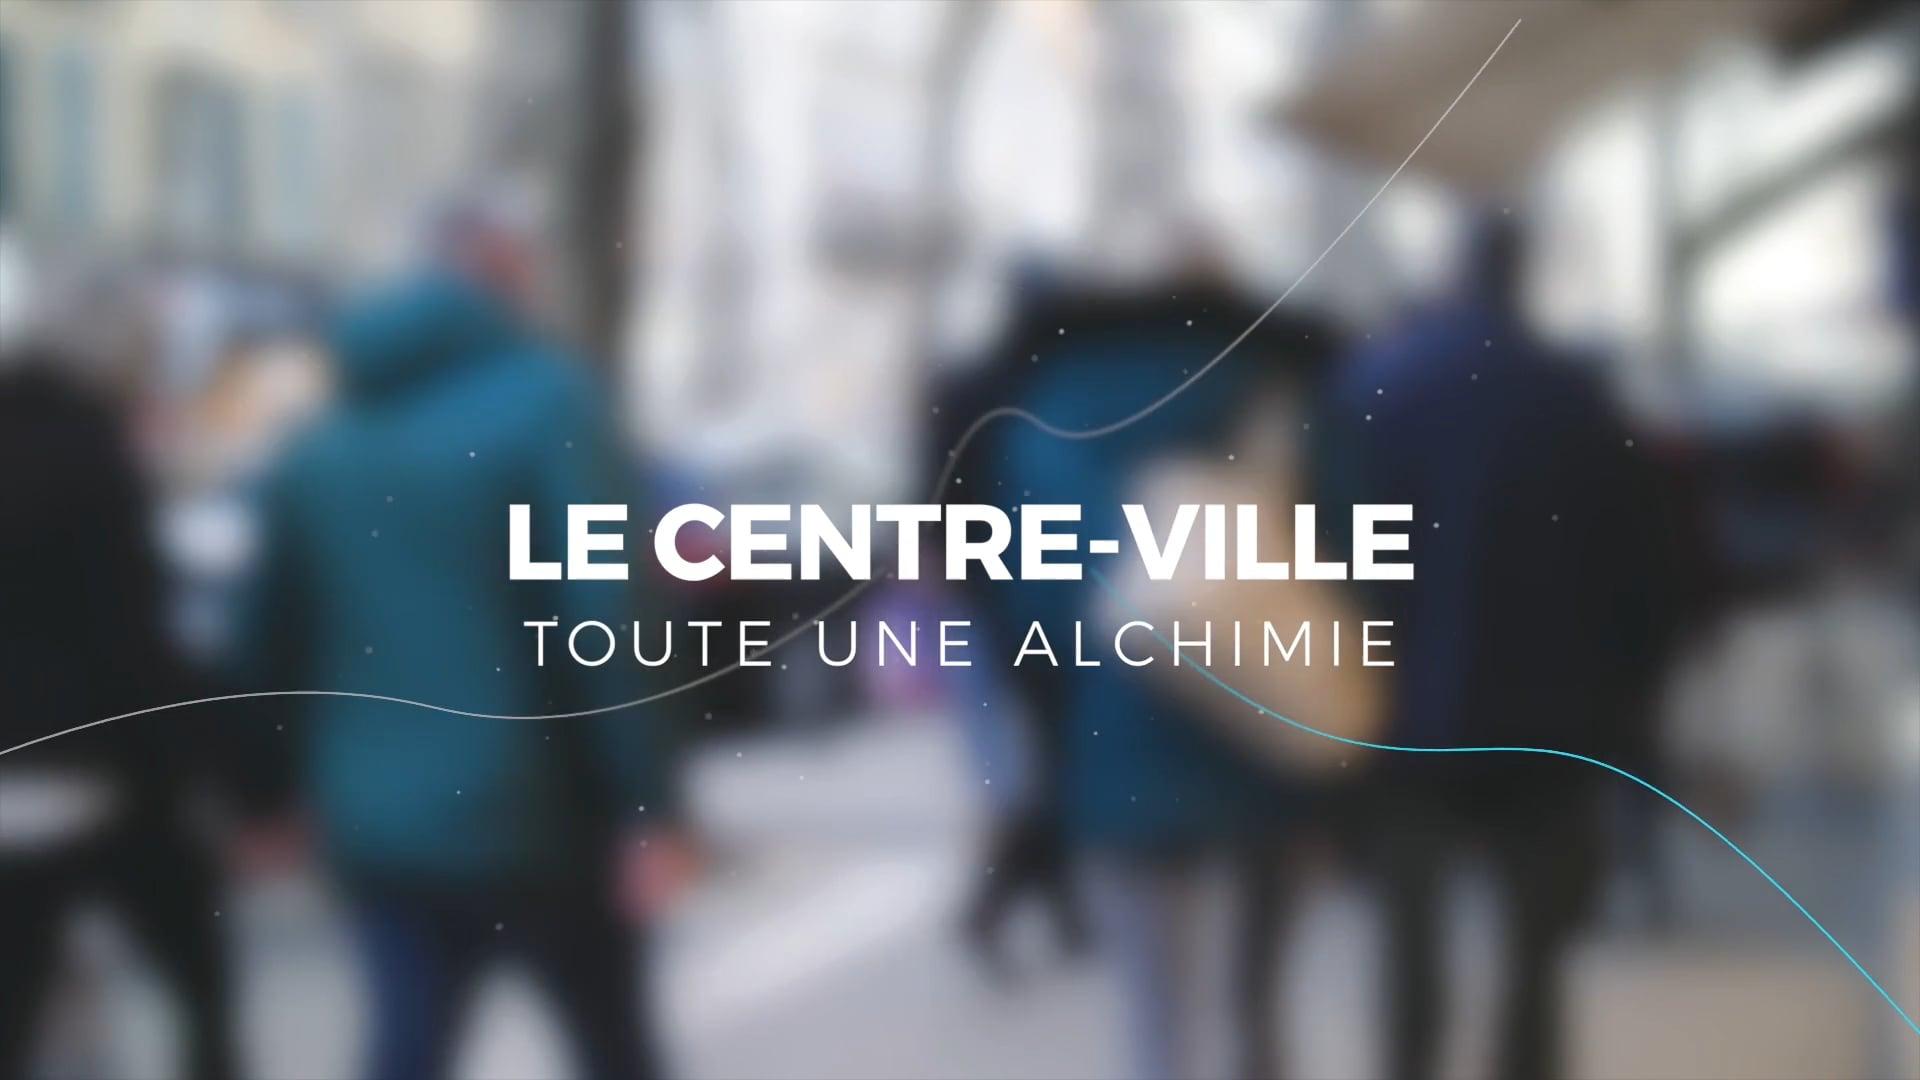 LA REDYNAMISATION DES CENTRES-VILLES